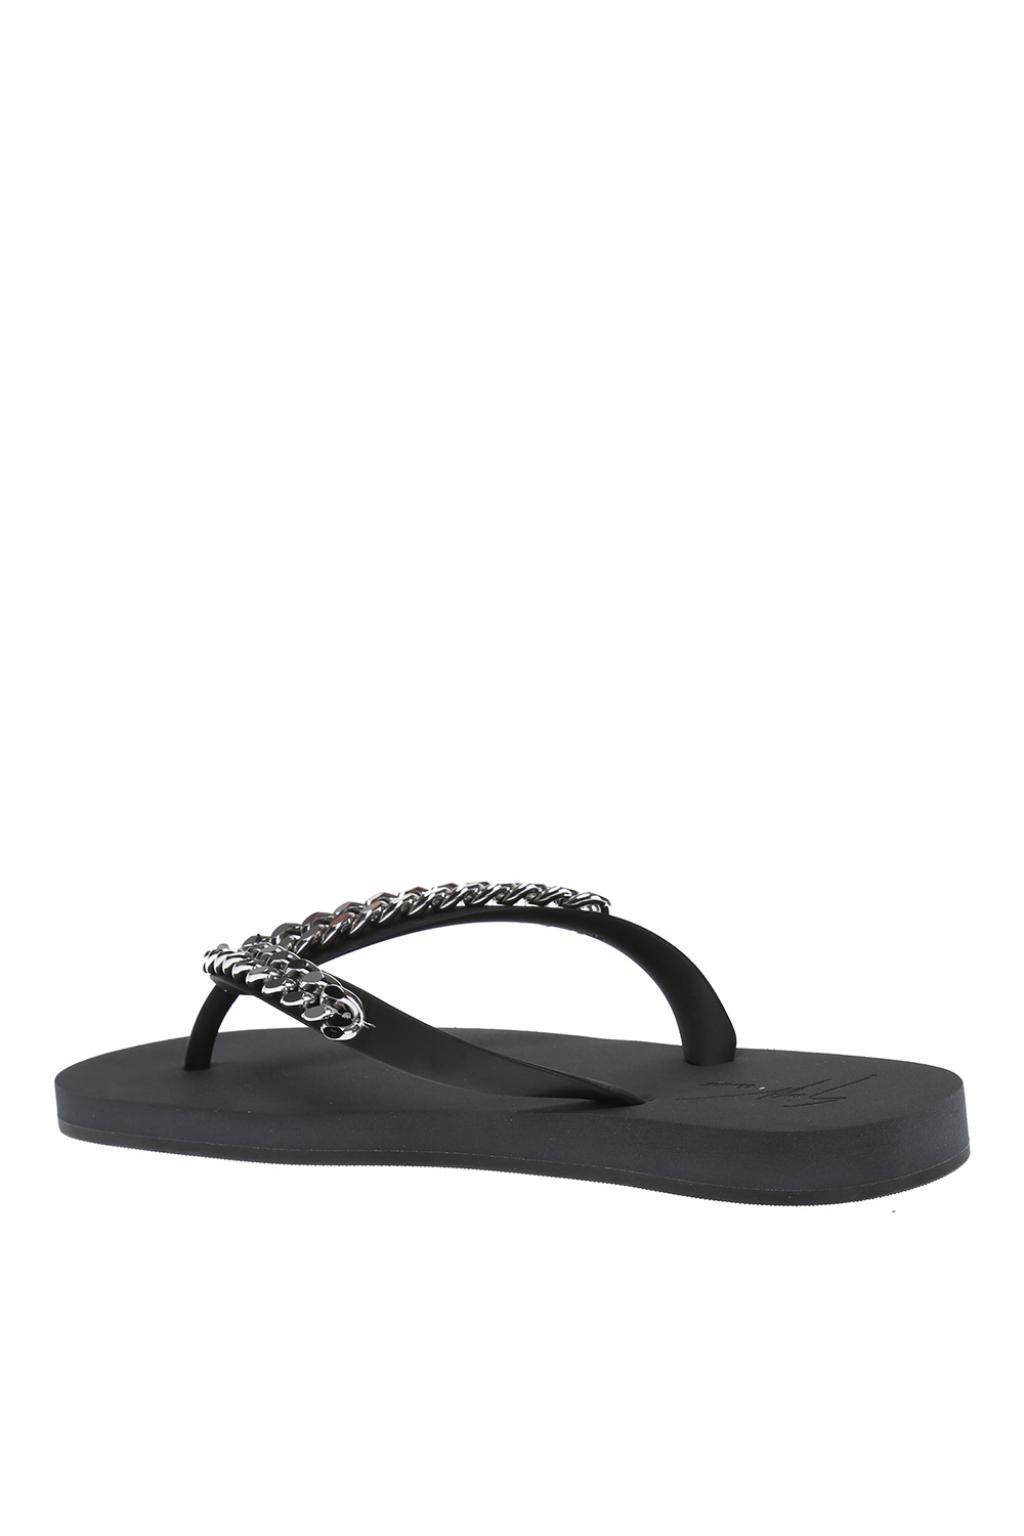 Giuseppe Zanotti Florida chain flip flops